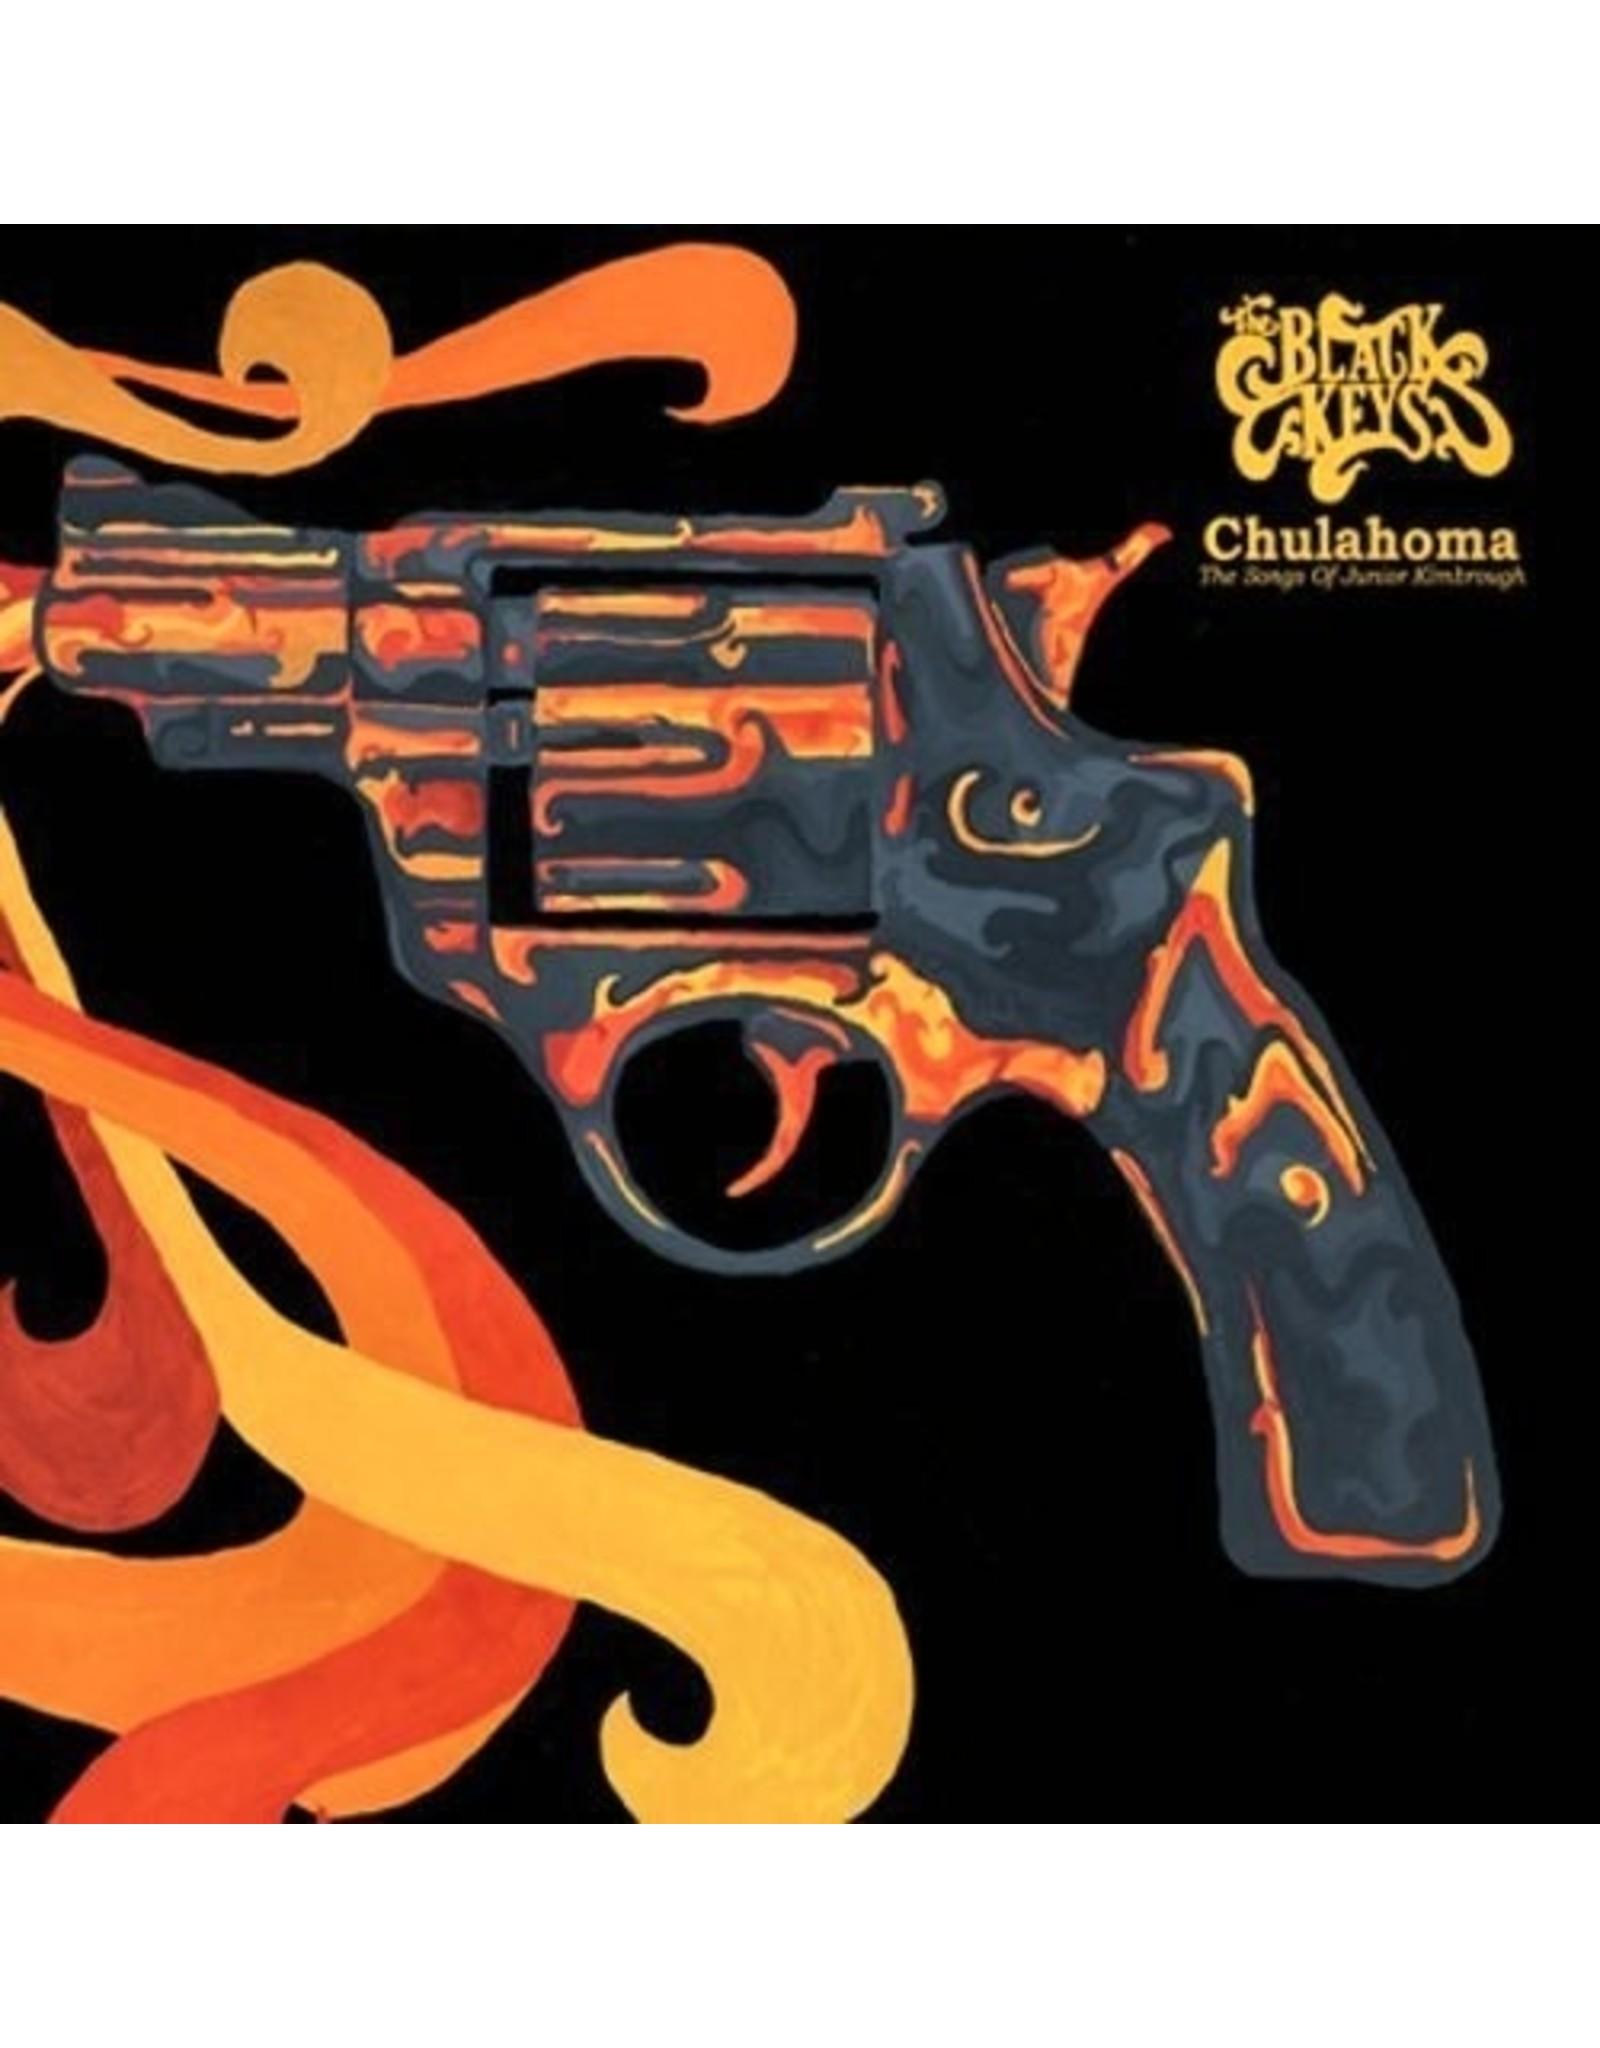 New Vinyl Black Keys - Chulahoma LP